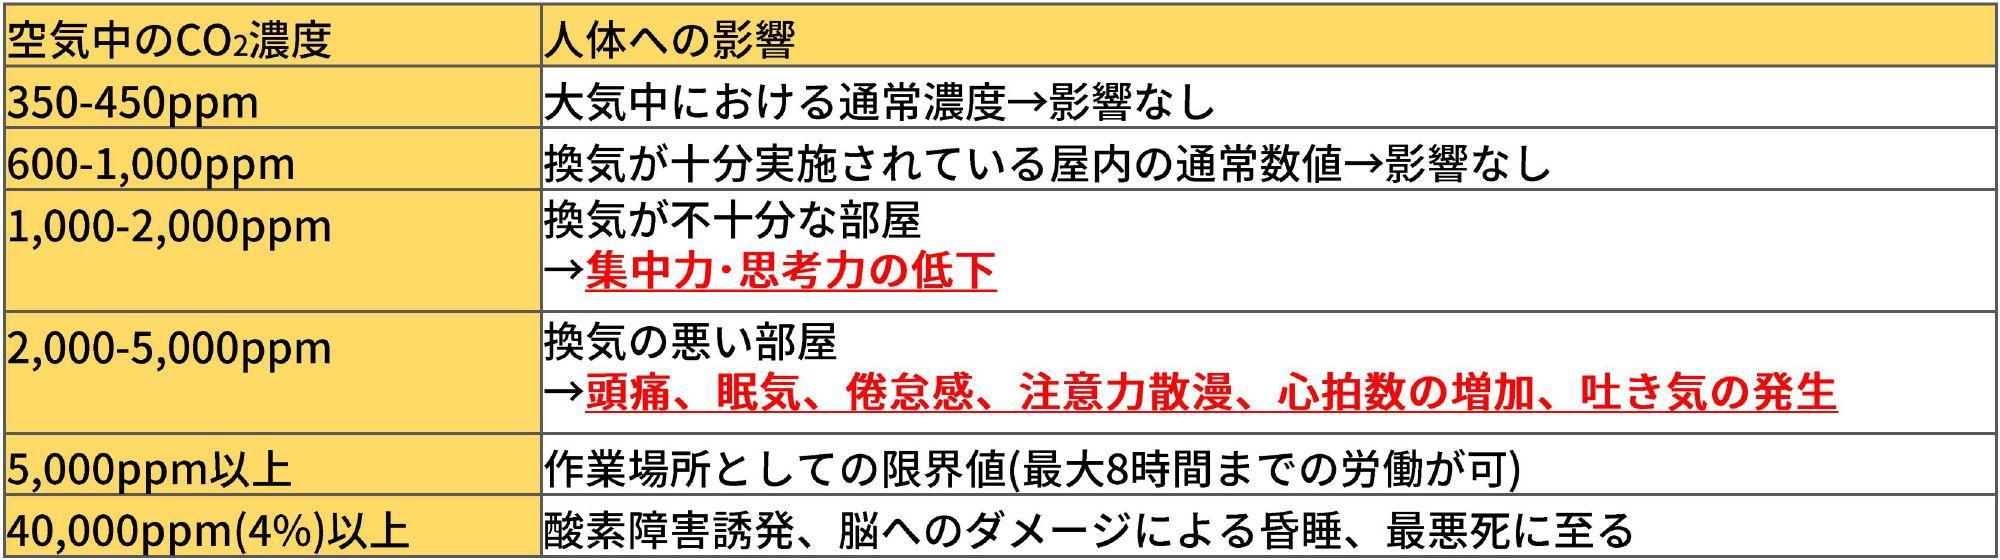 jp_testo-160IAQ_cloud_logger_doc2.png